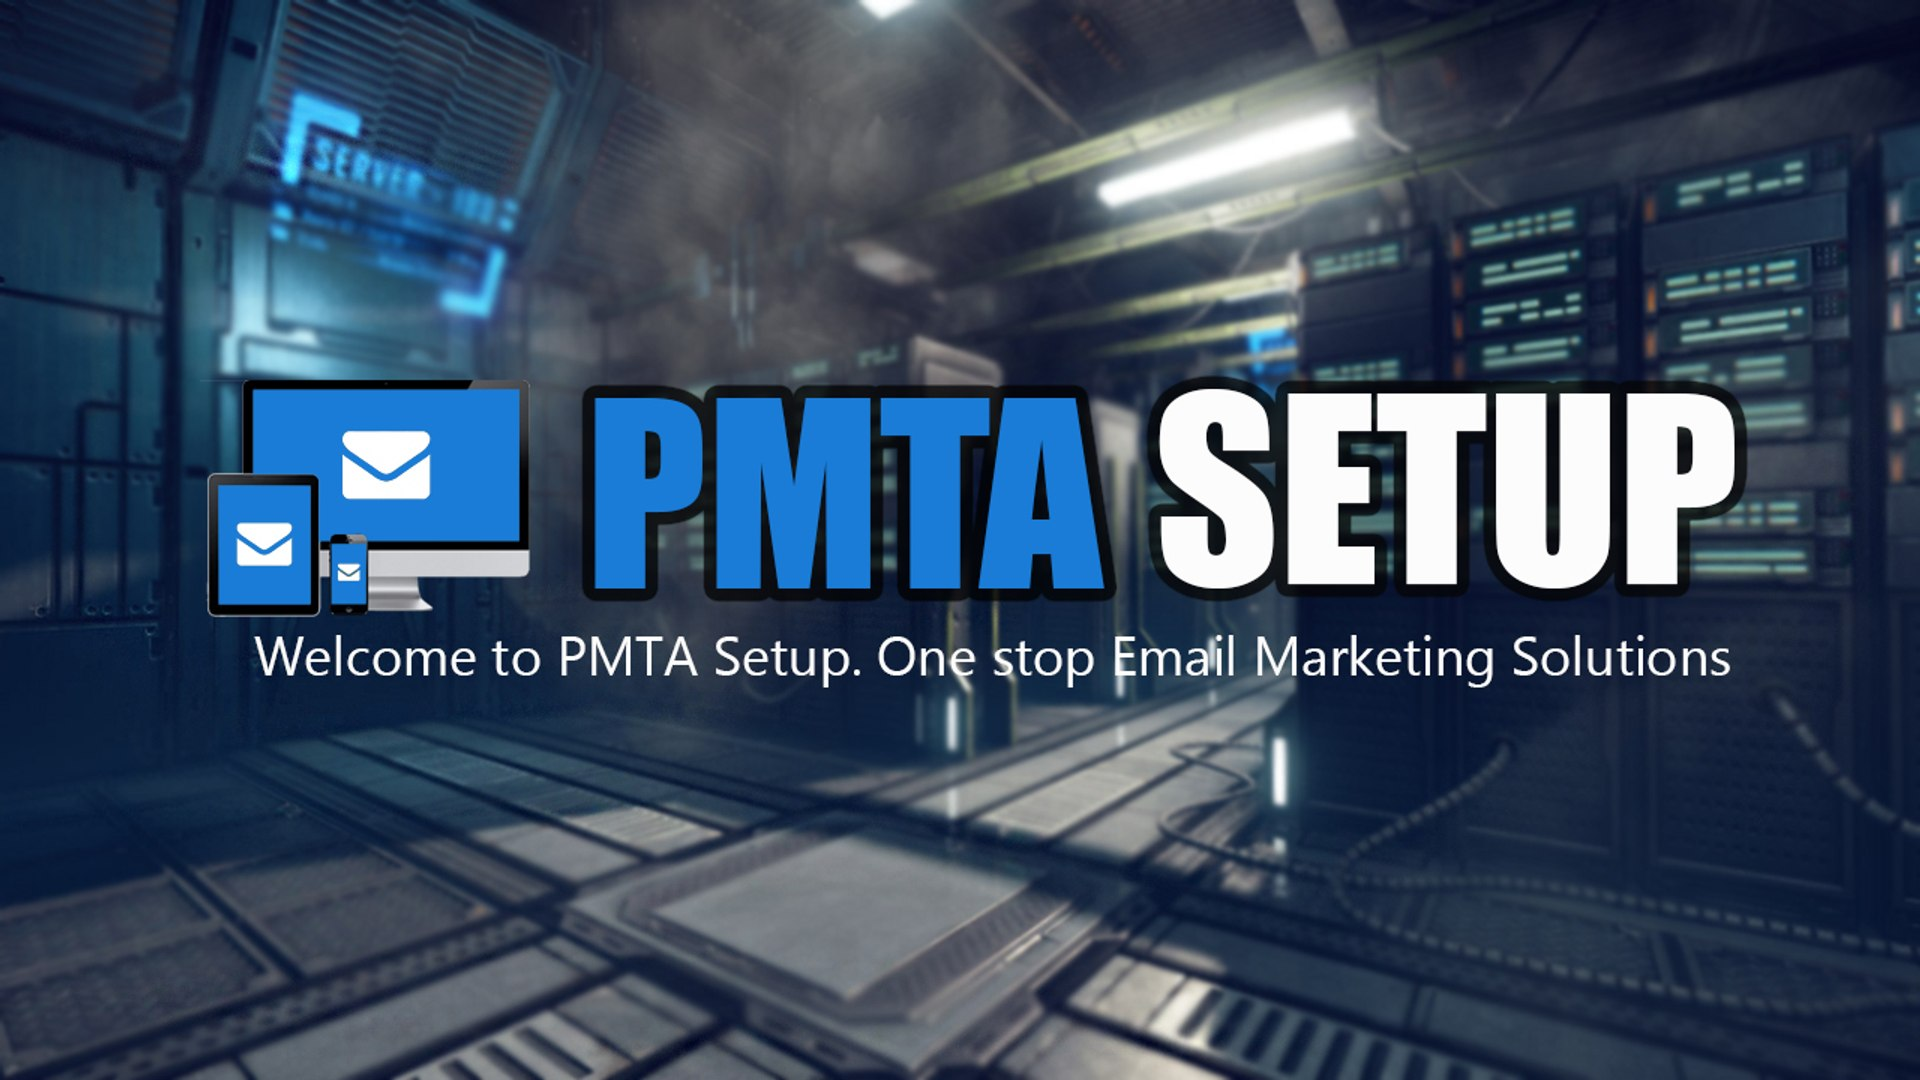 PMTA - Power MTA Servers featuring Bulletproof Hosting at PMTASetUp com